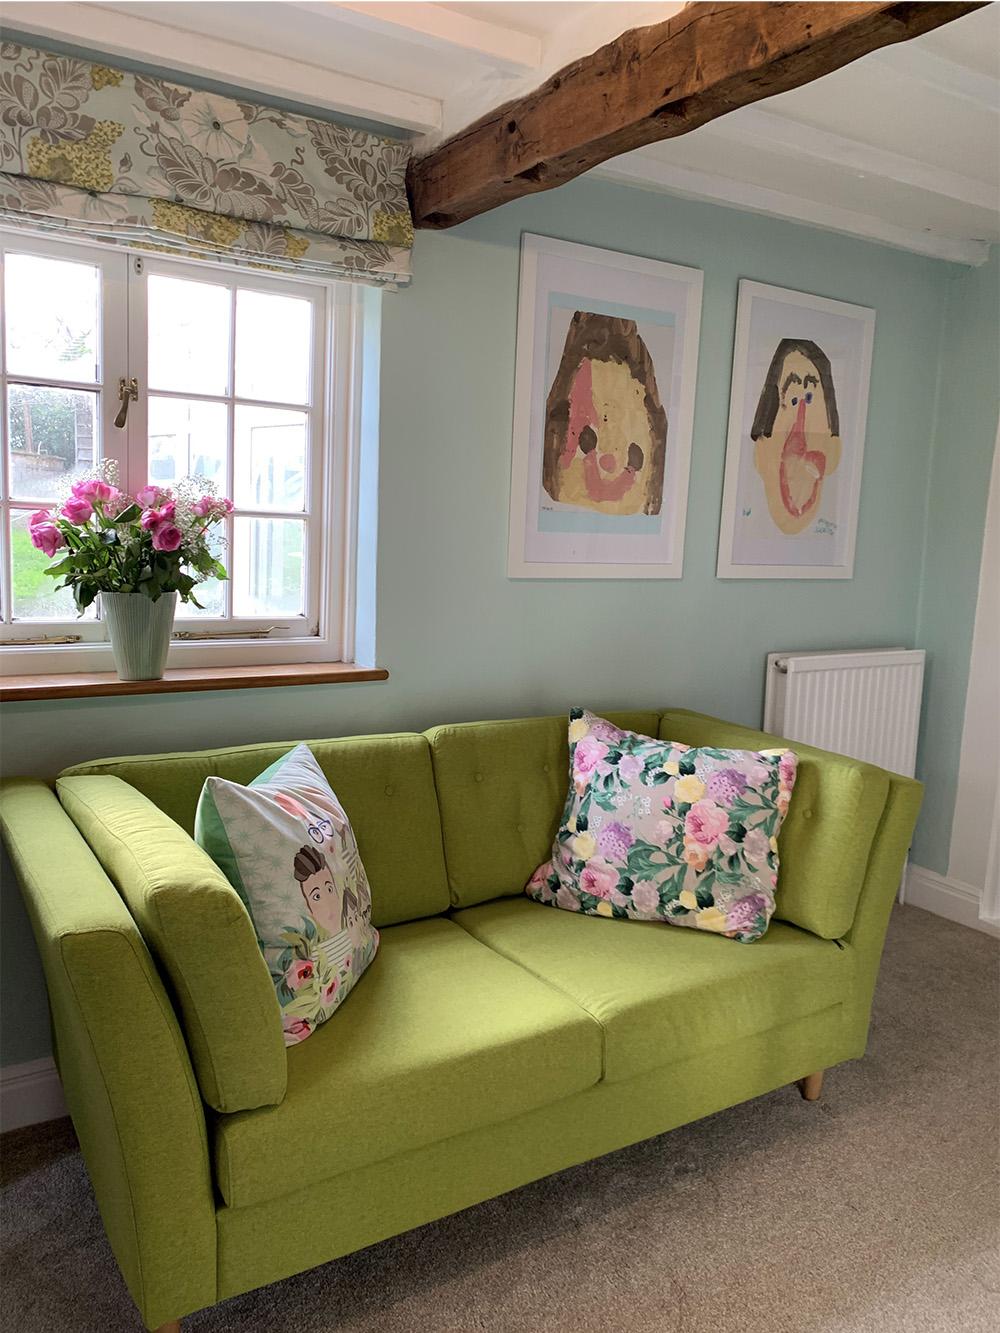 Green sofa Viko with additional decorative cushions